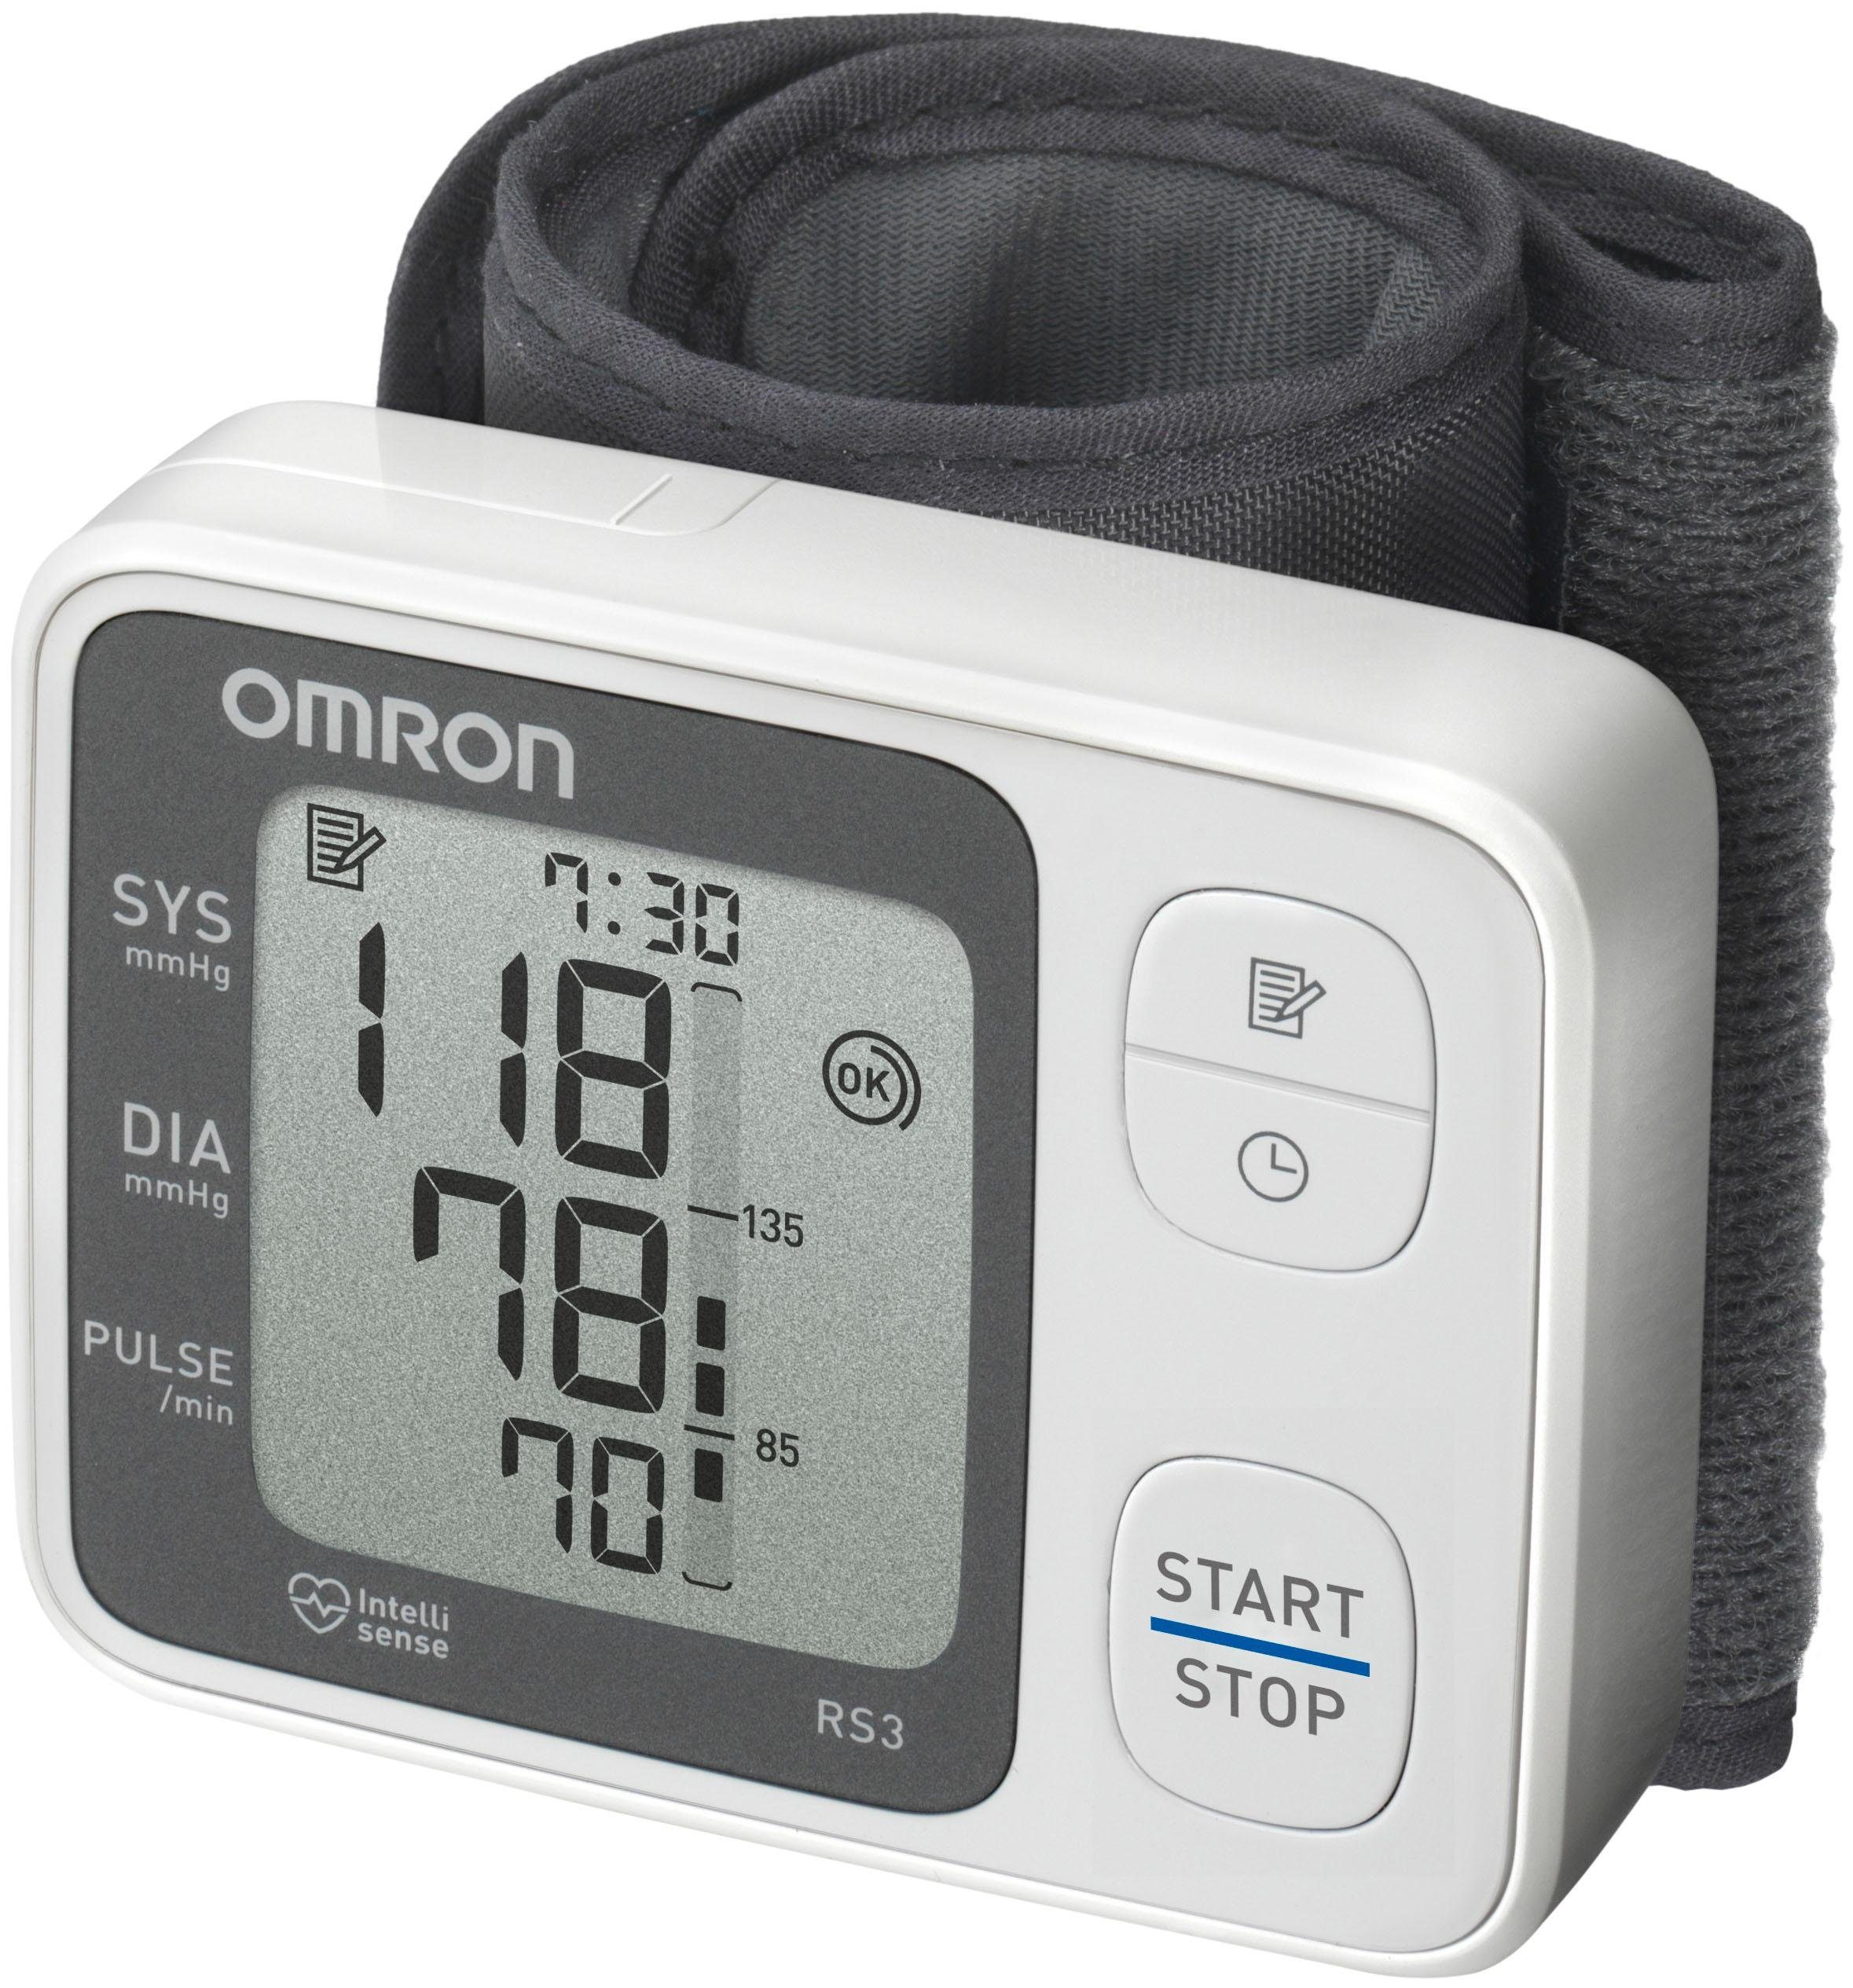 Omron Blutdruckmessgerät RS3 (HEM-6130-D)